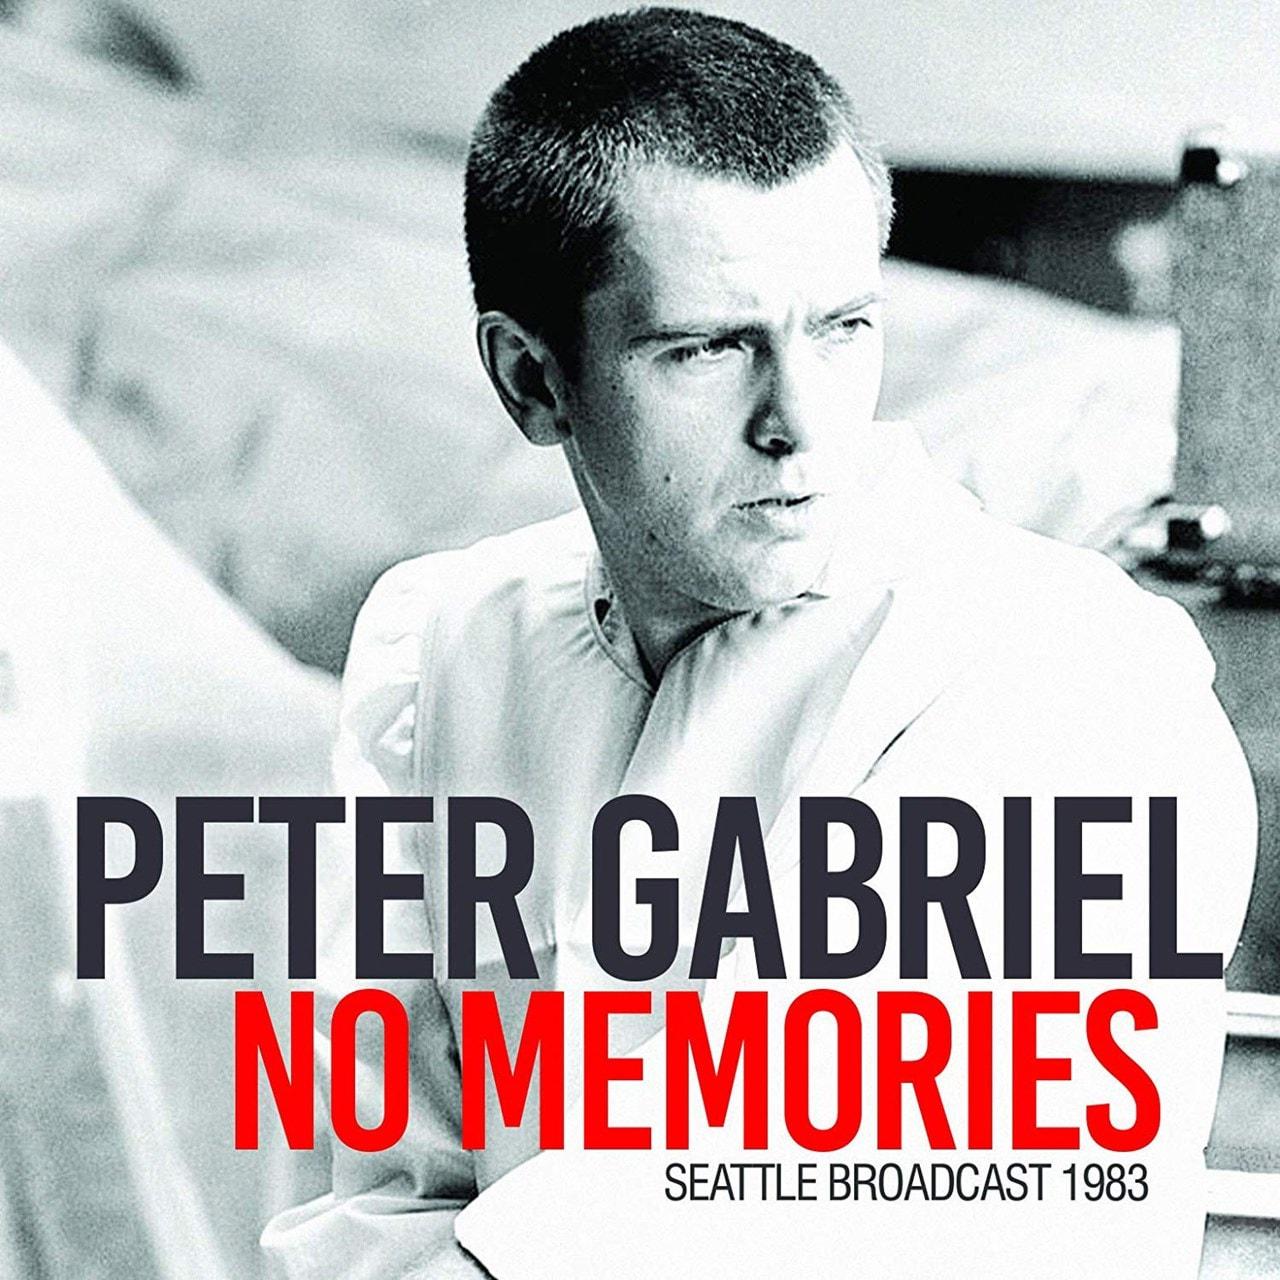 No Memories: Seattle Broadcast 1983 - 1